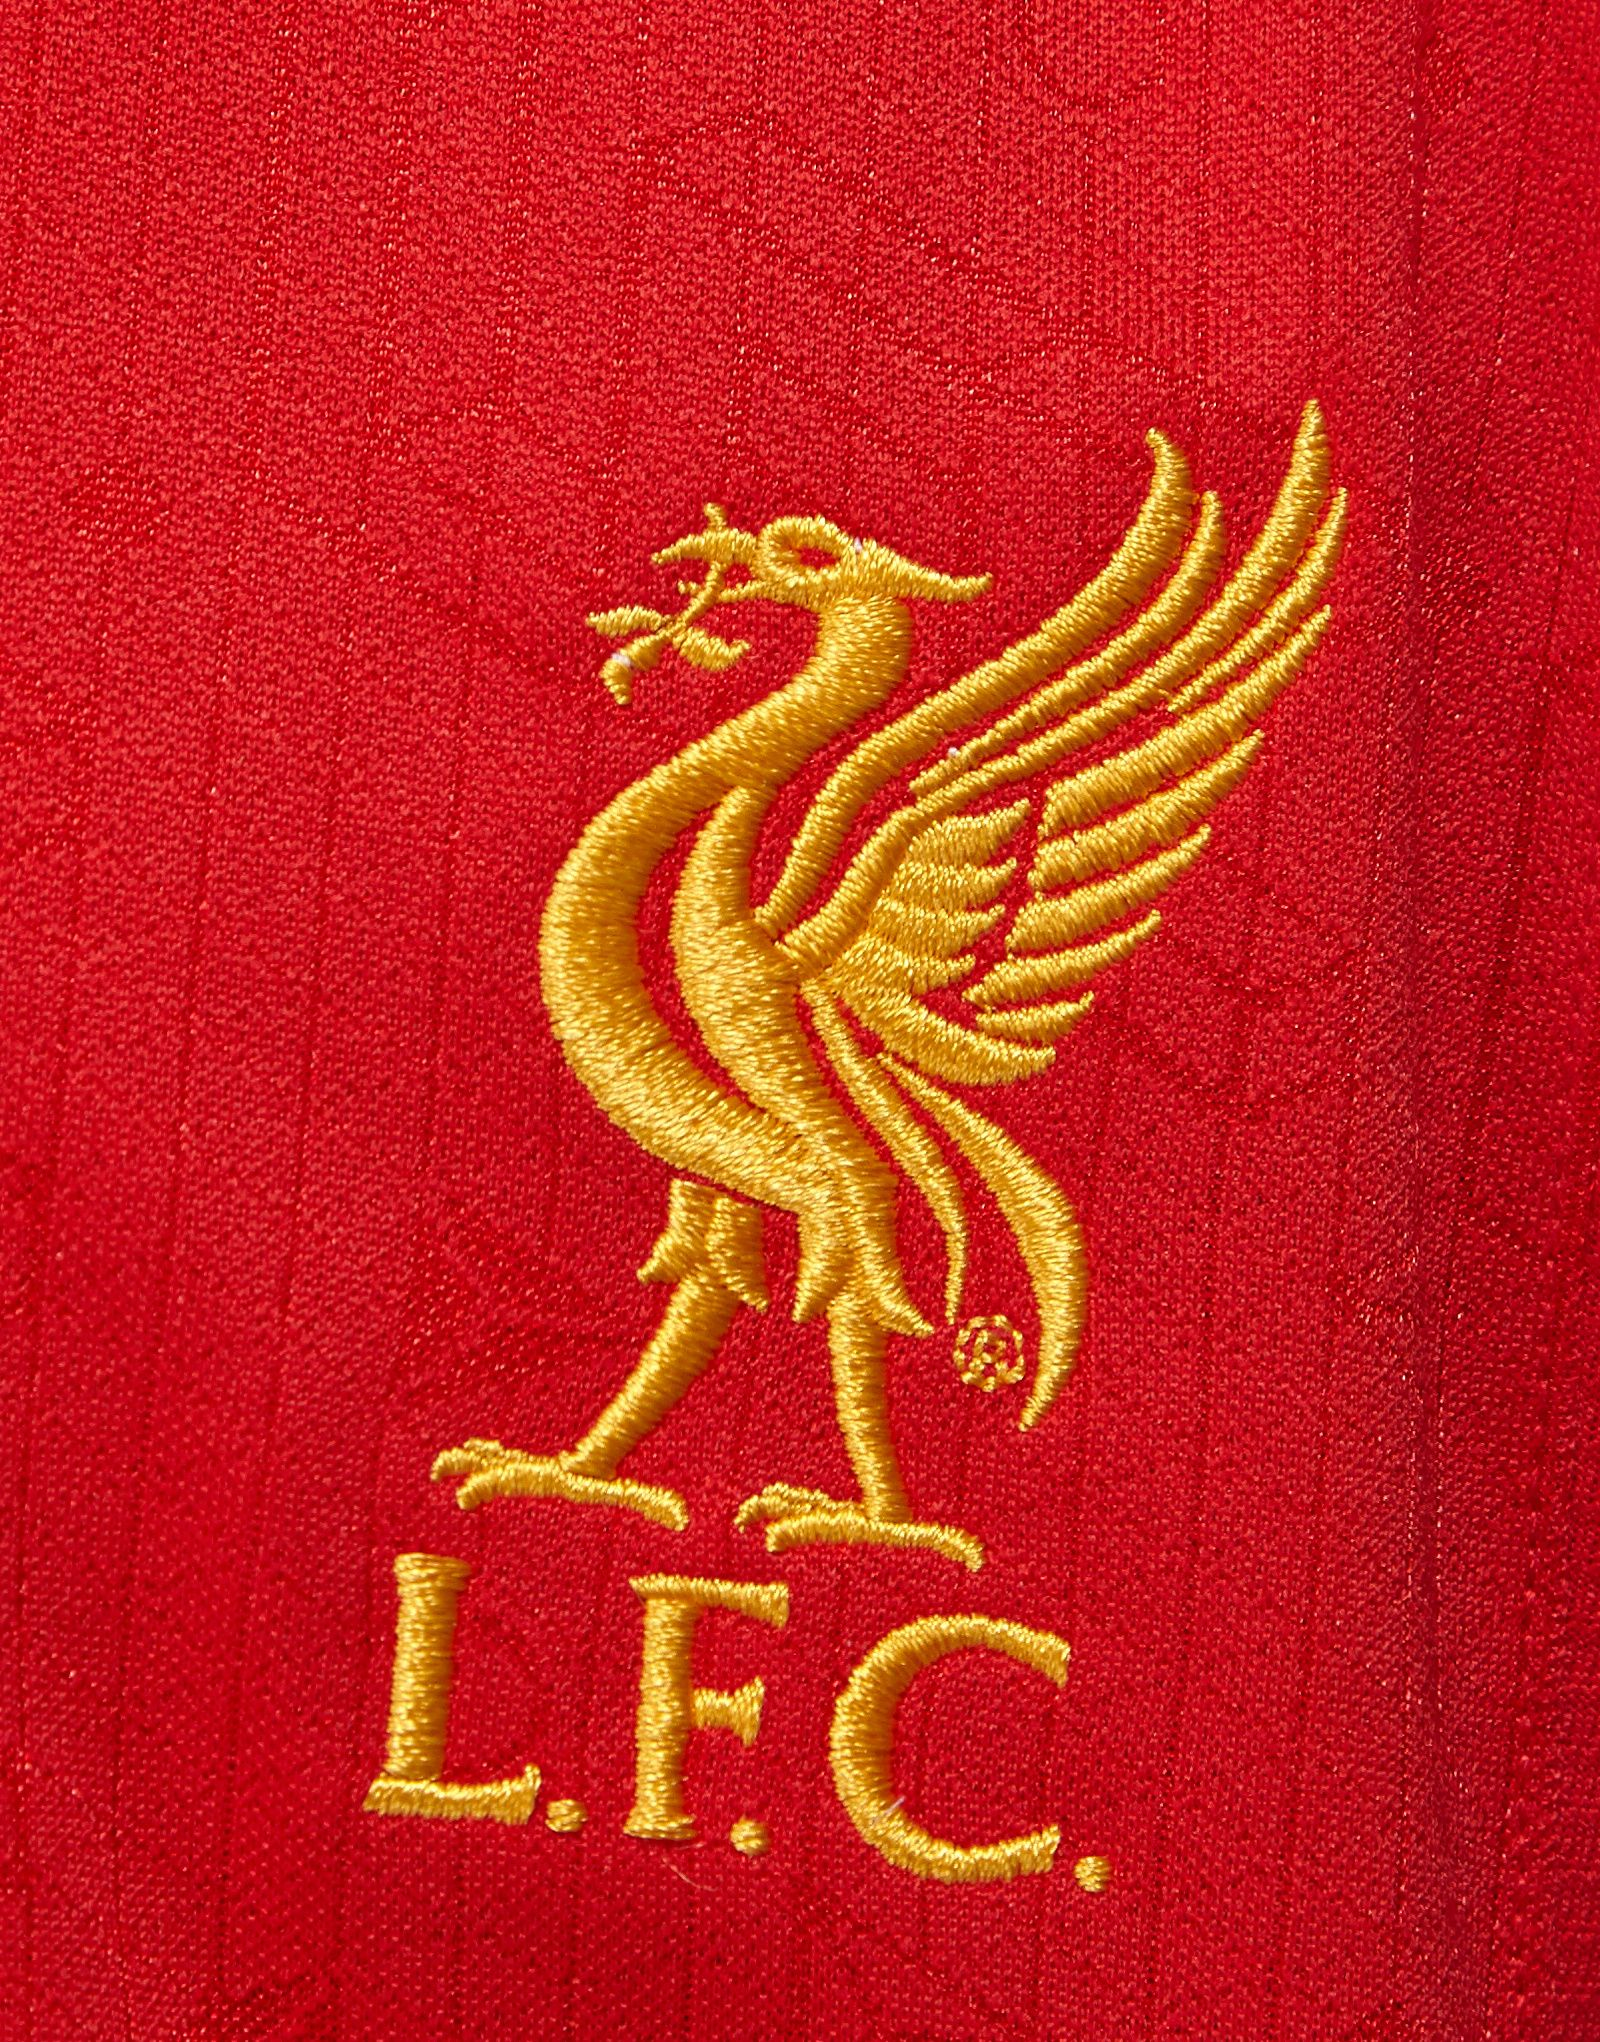 Warrior Sports Liverpool 2014 Junior Home Shirt